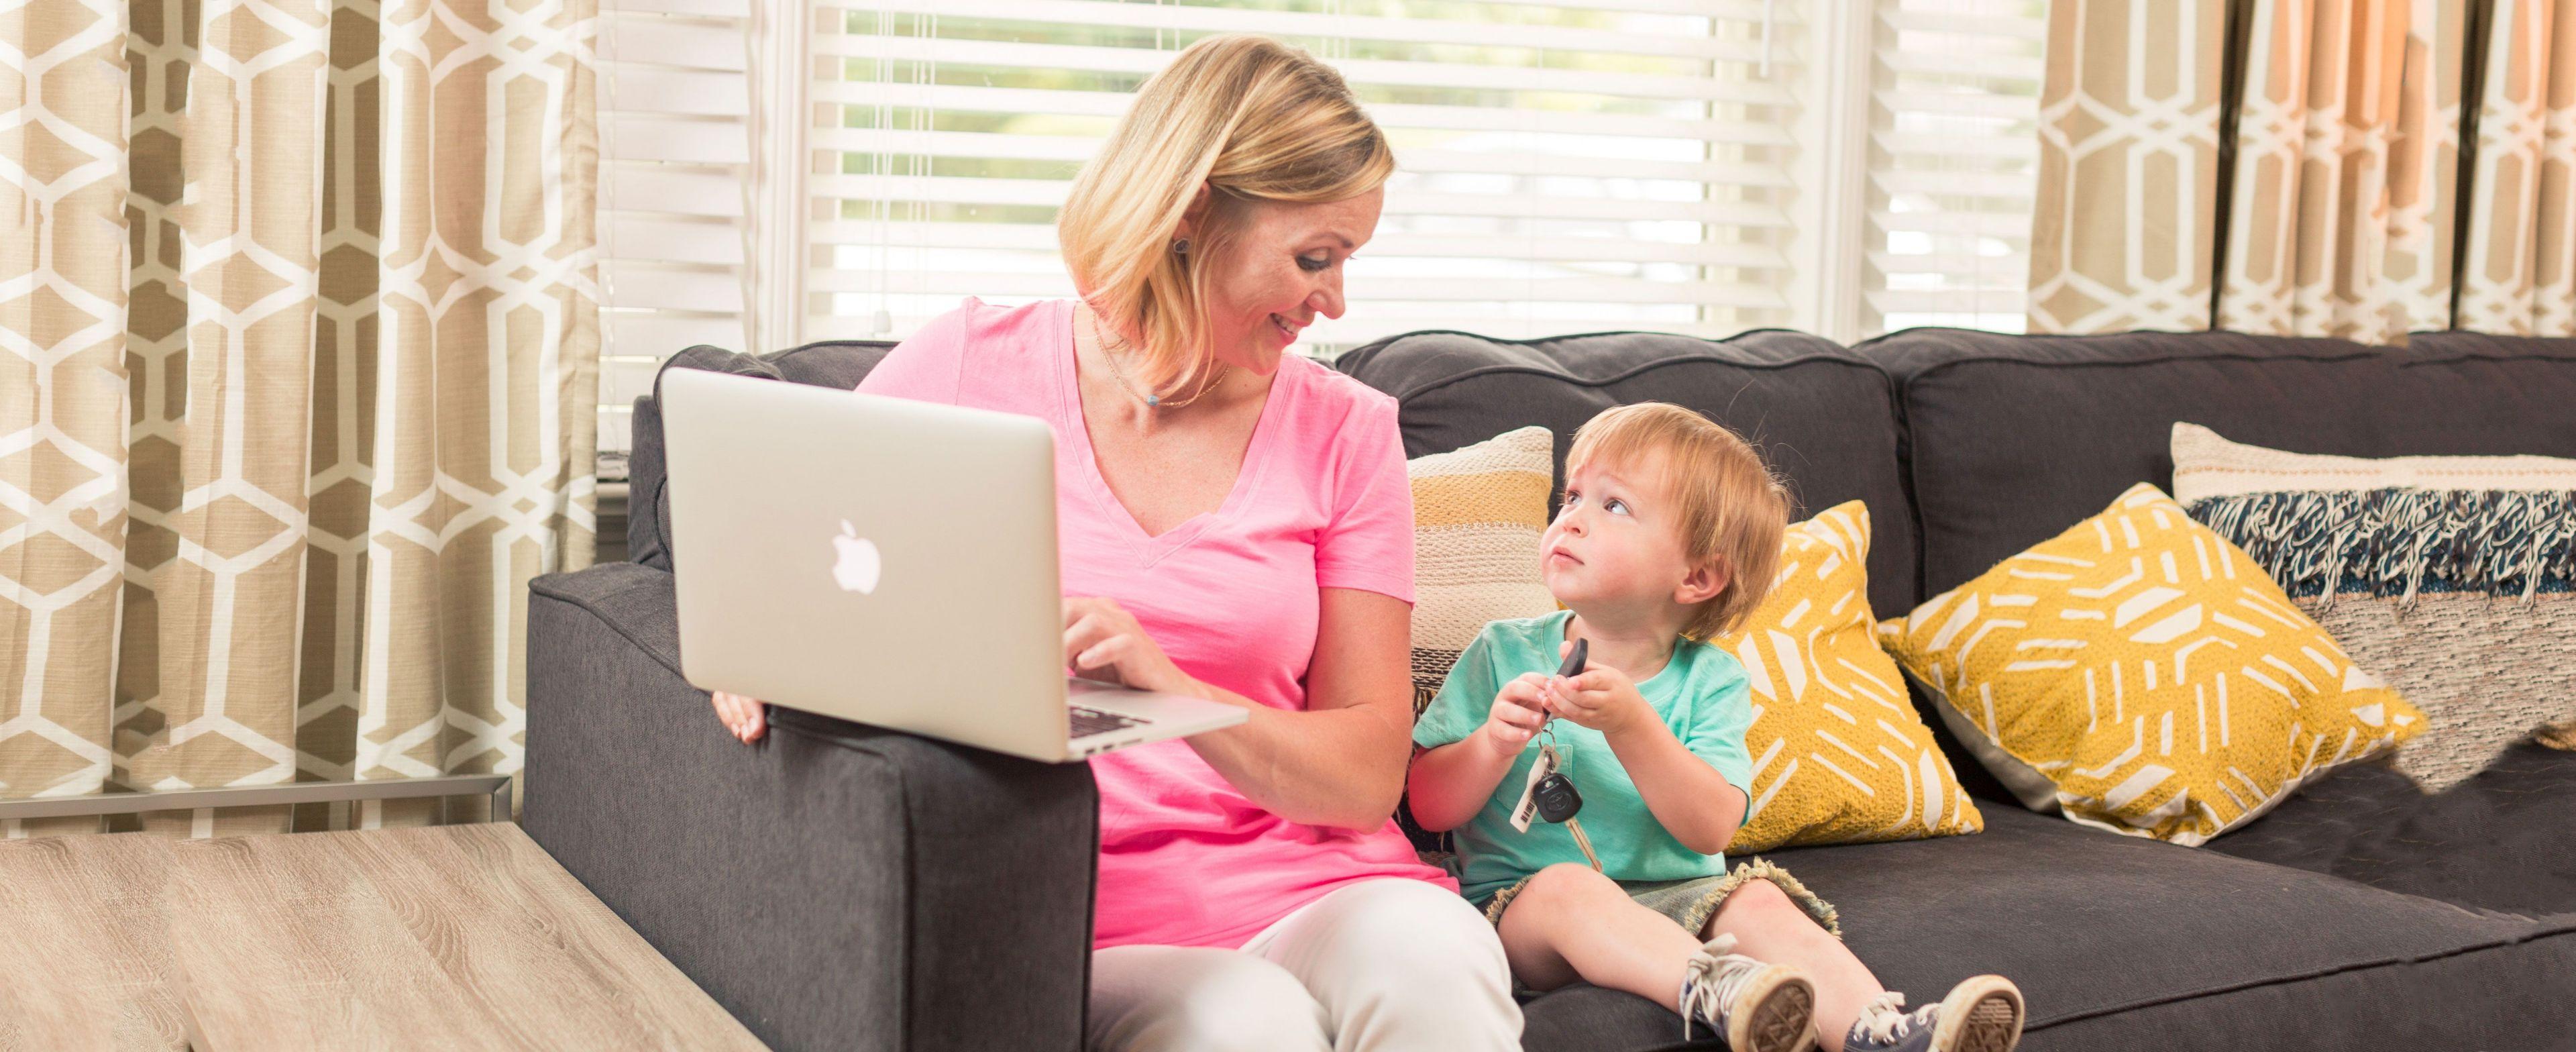 Bachelors Degree Online Programs | Liberty University